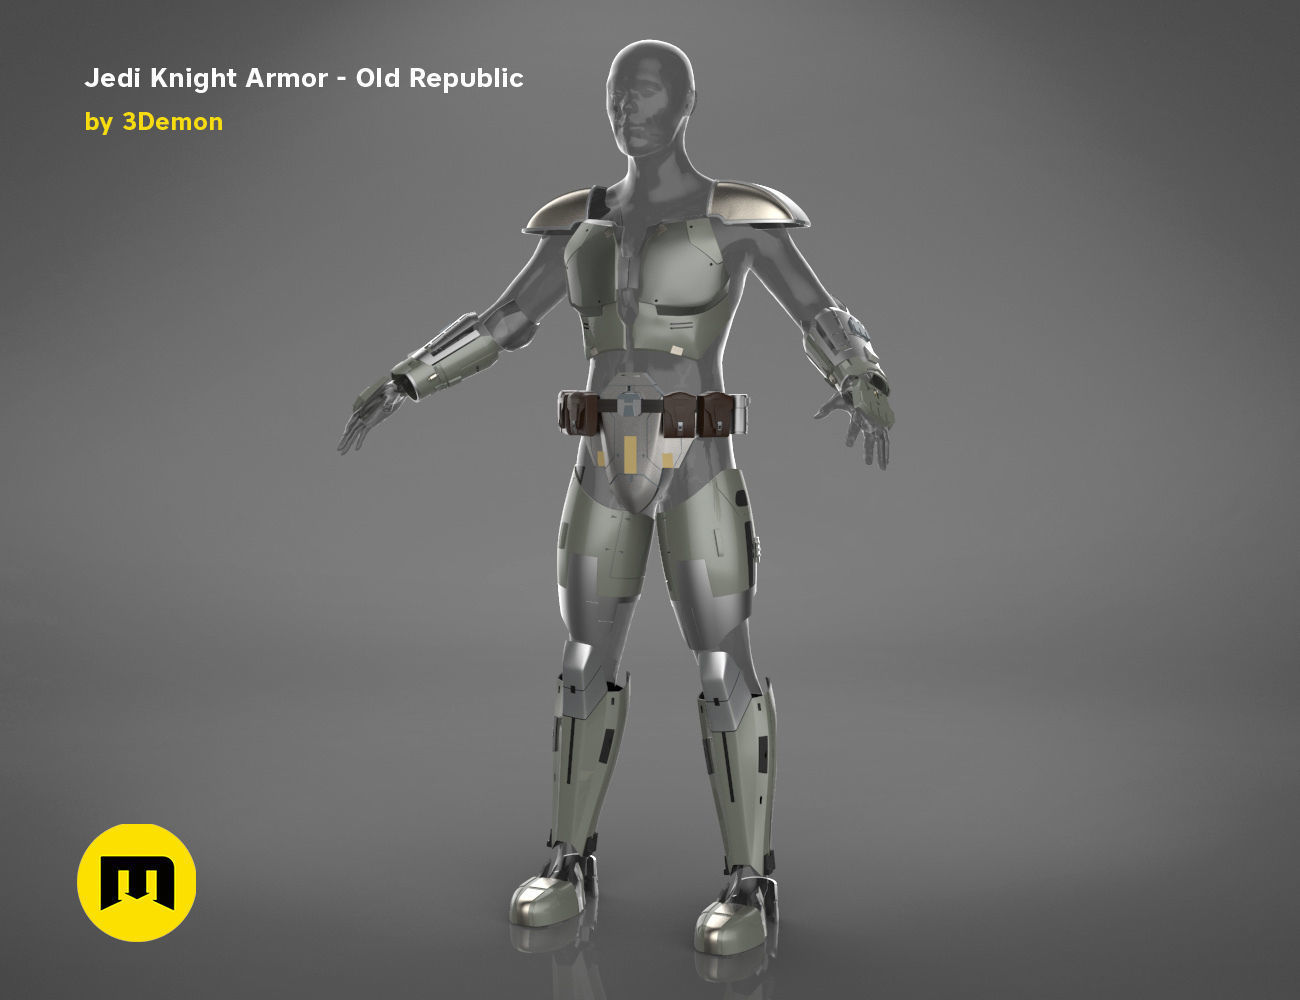 leather cuff Mandalorian armor Fantasy syfy Jedi Knight armor leather gauntlets Jedi logo Clone wars Jedi armor Skywalker